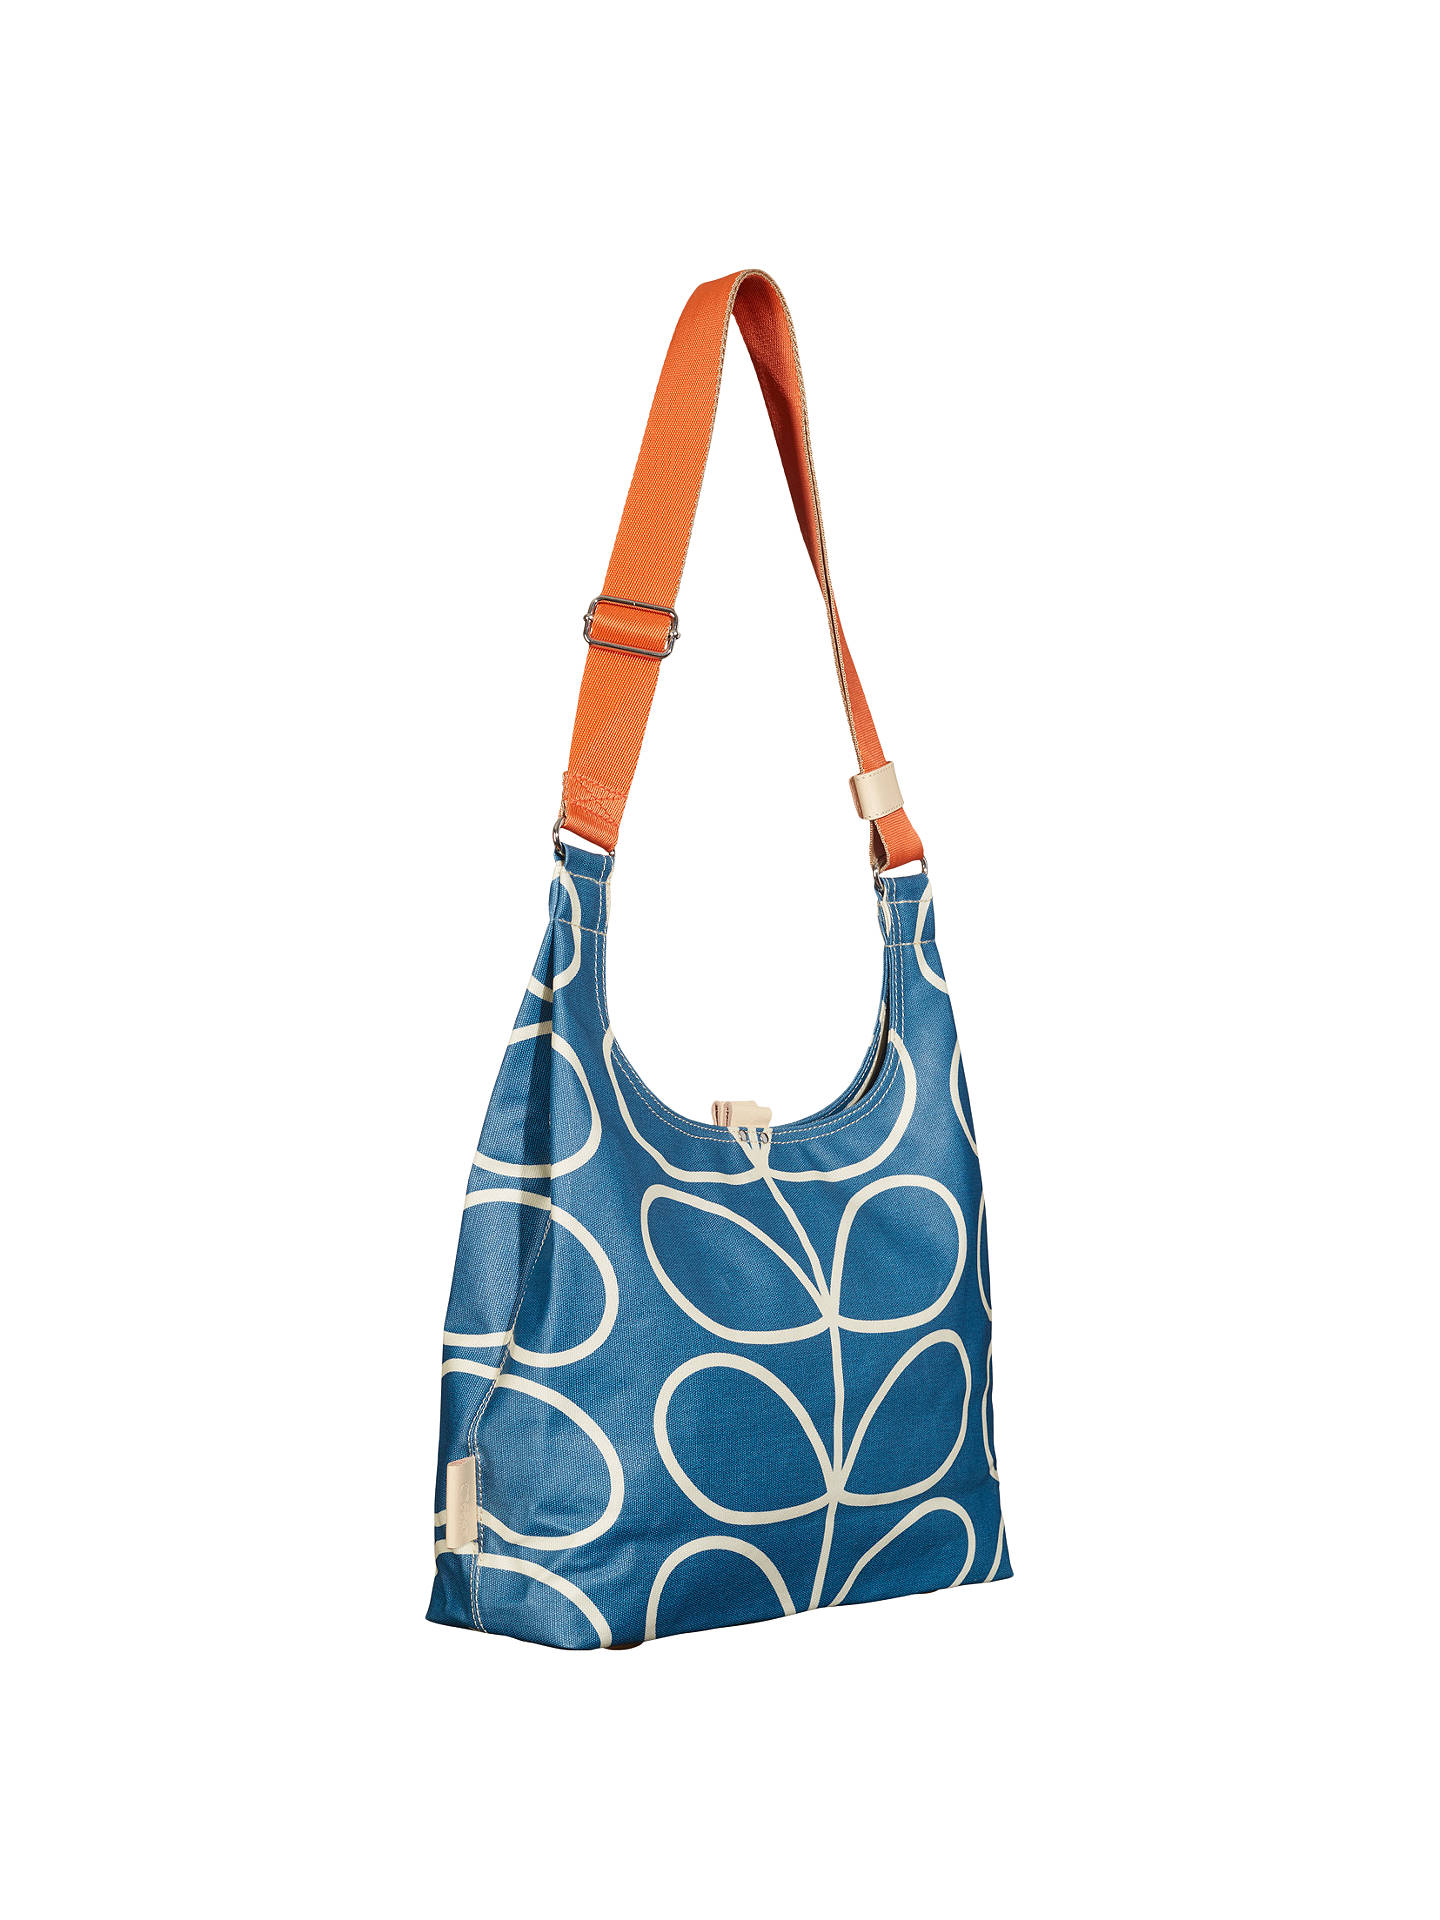 b3eb860db8 Buy Orla Kiely Giant Linear Stem Canvas Shoulder Bag